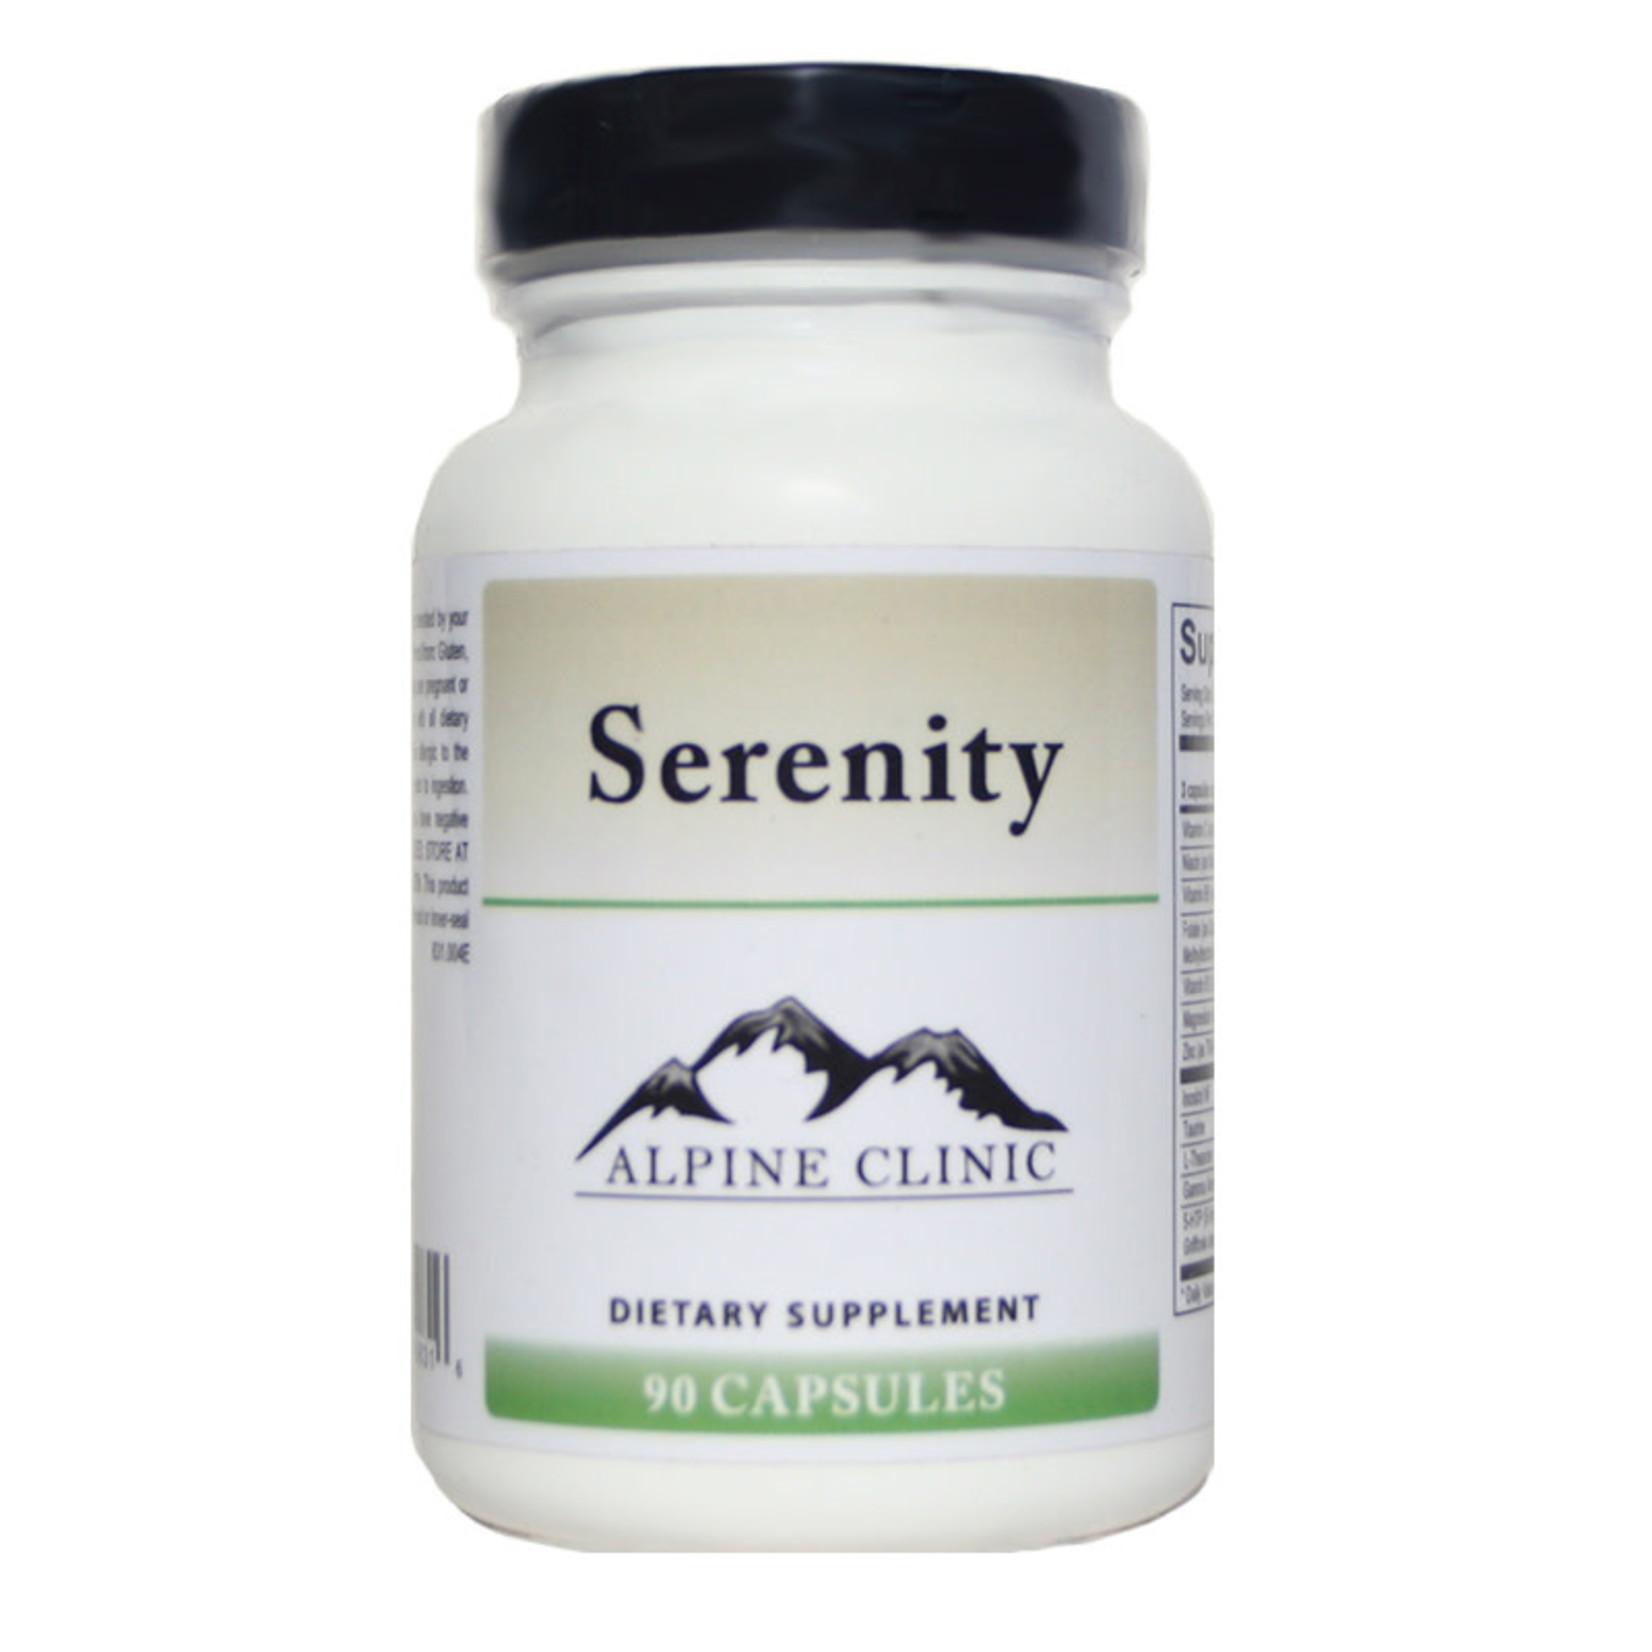 Alpine Clinic PL Serenity